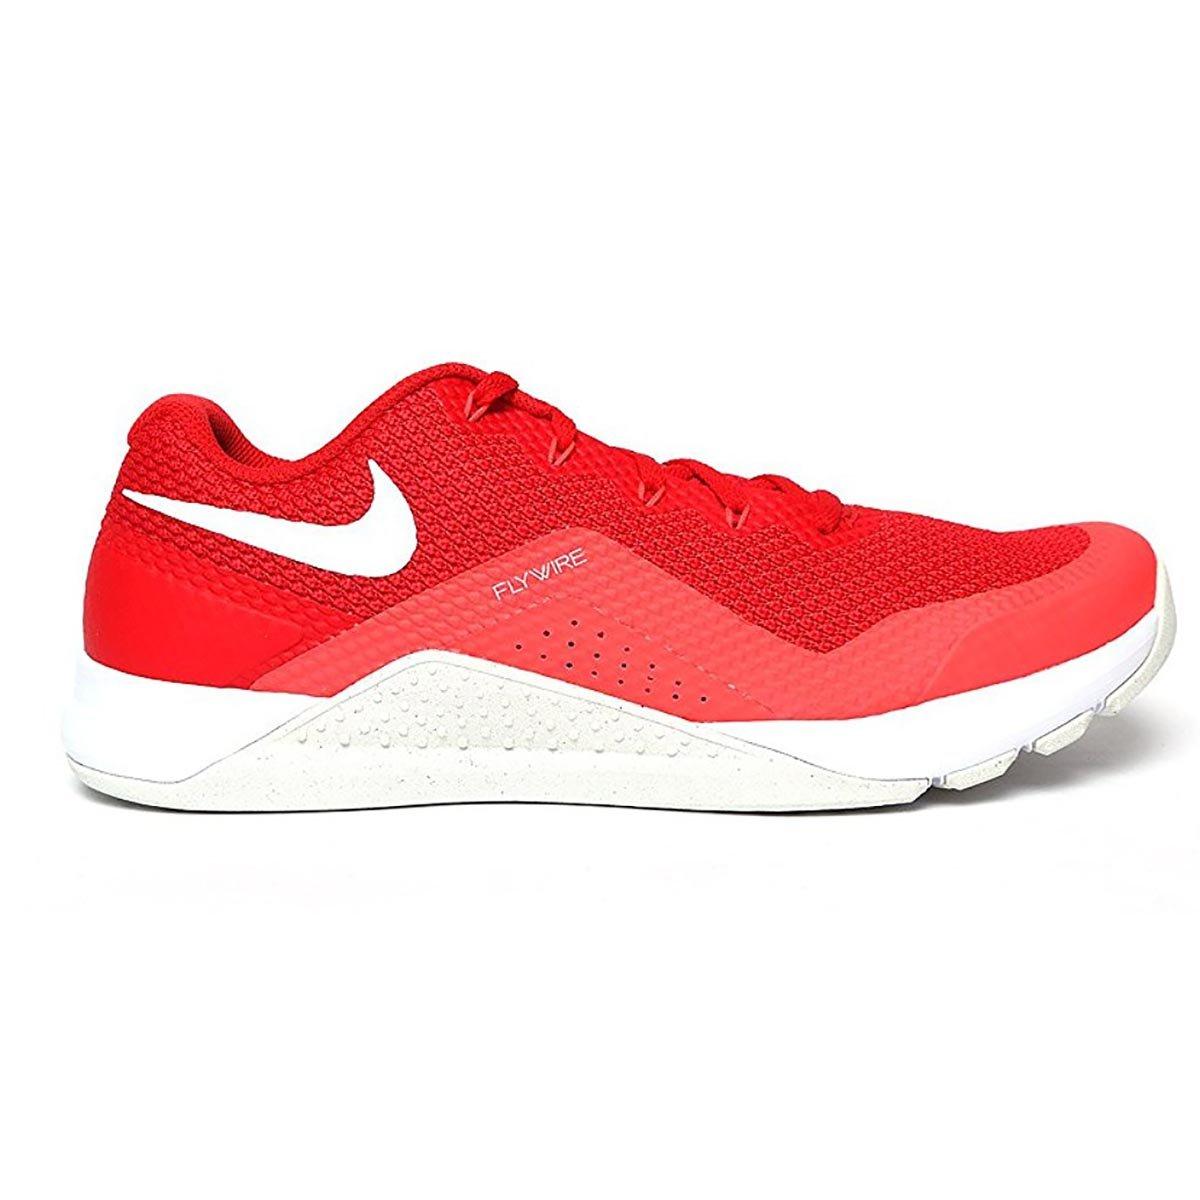 NIKE Men's Metcon Repper DSX Training Shoe B006OCA6EI 13 D(M) US|University Red/White